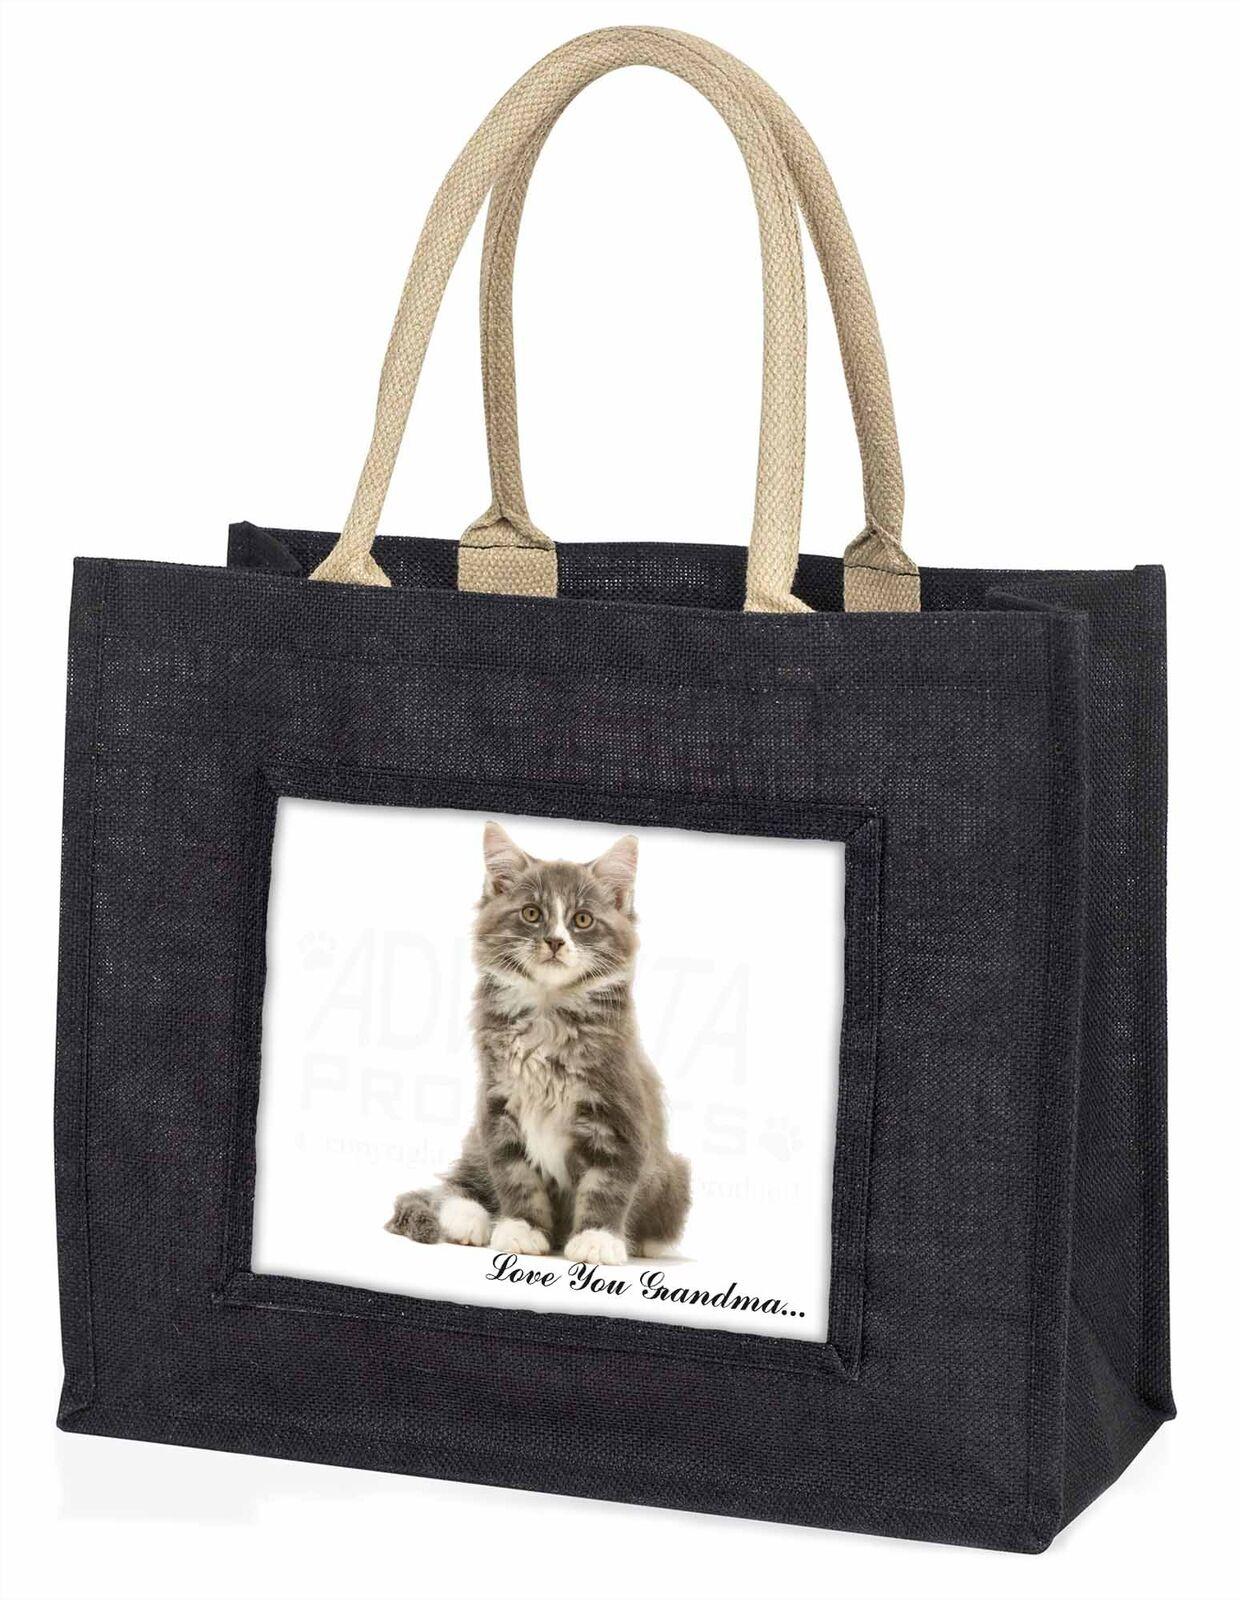 Silver Tabby Cat 'Love You Grandma' Large Black Shopping Bag Chris, AC-187lygBLB